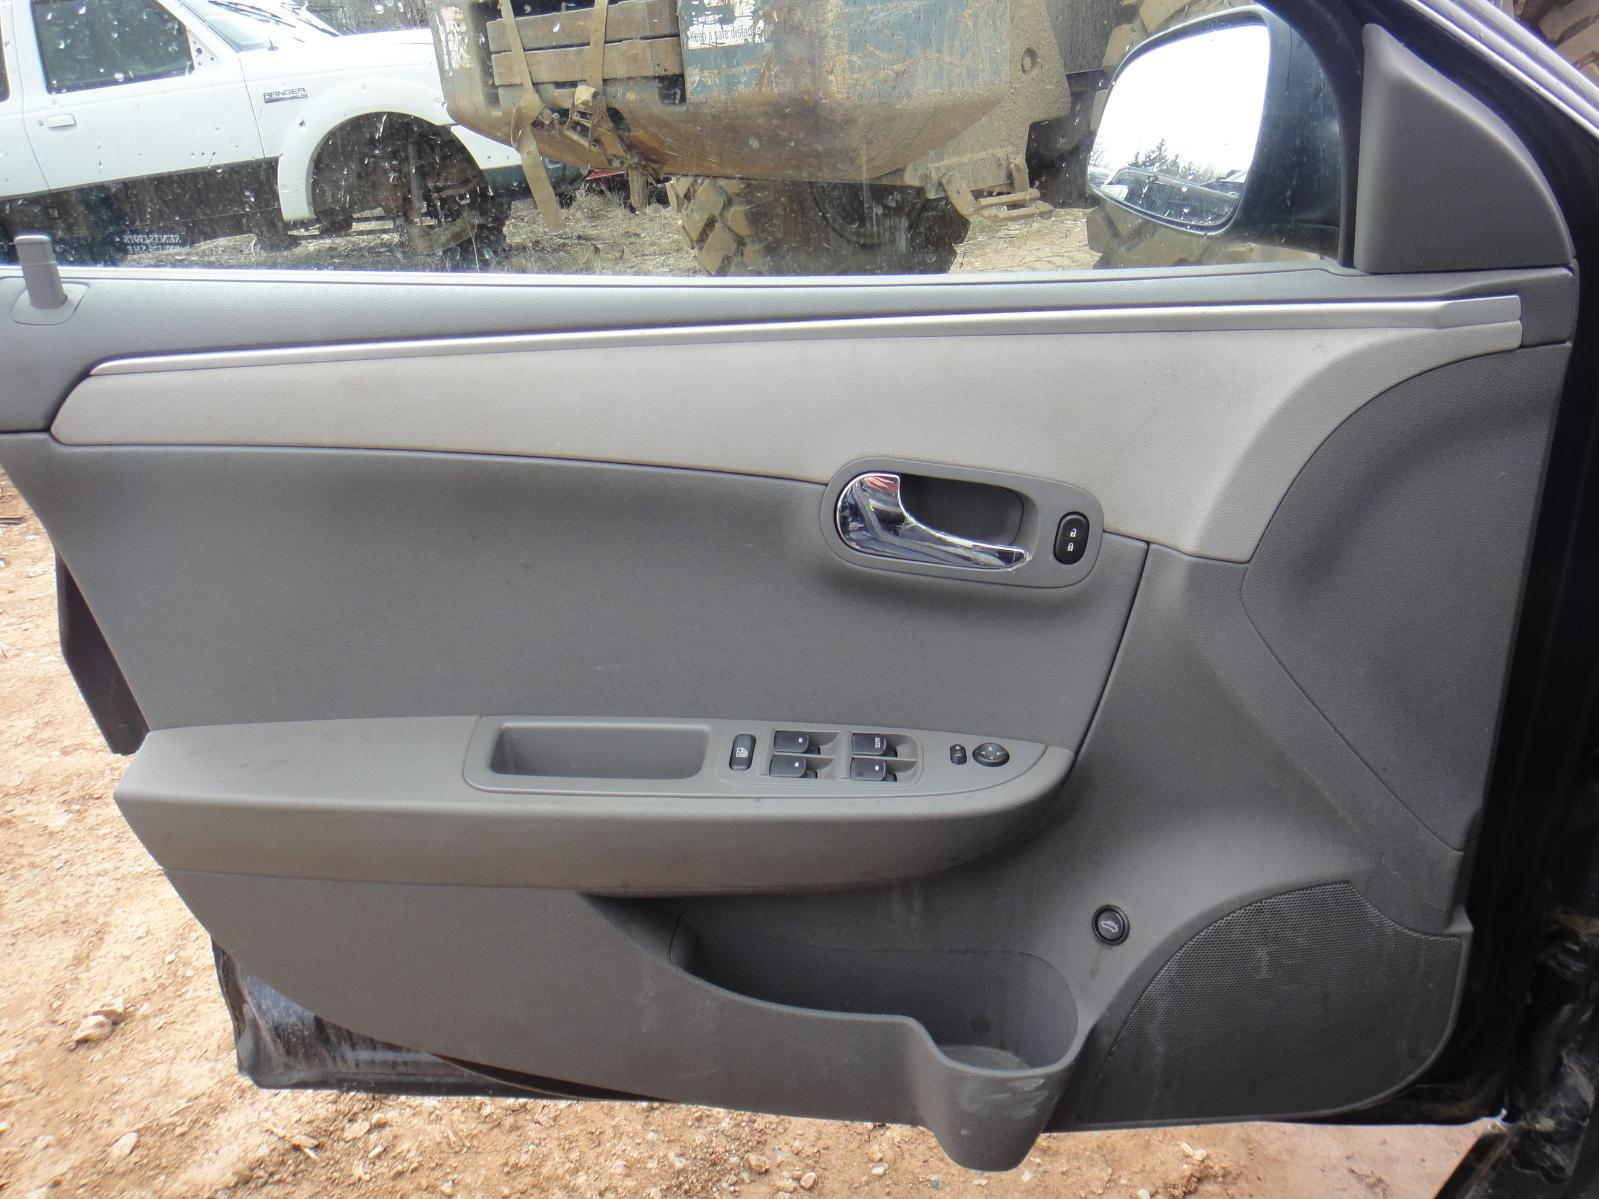 2010 Chevrolet Malibu LS full